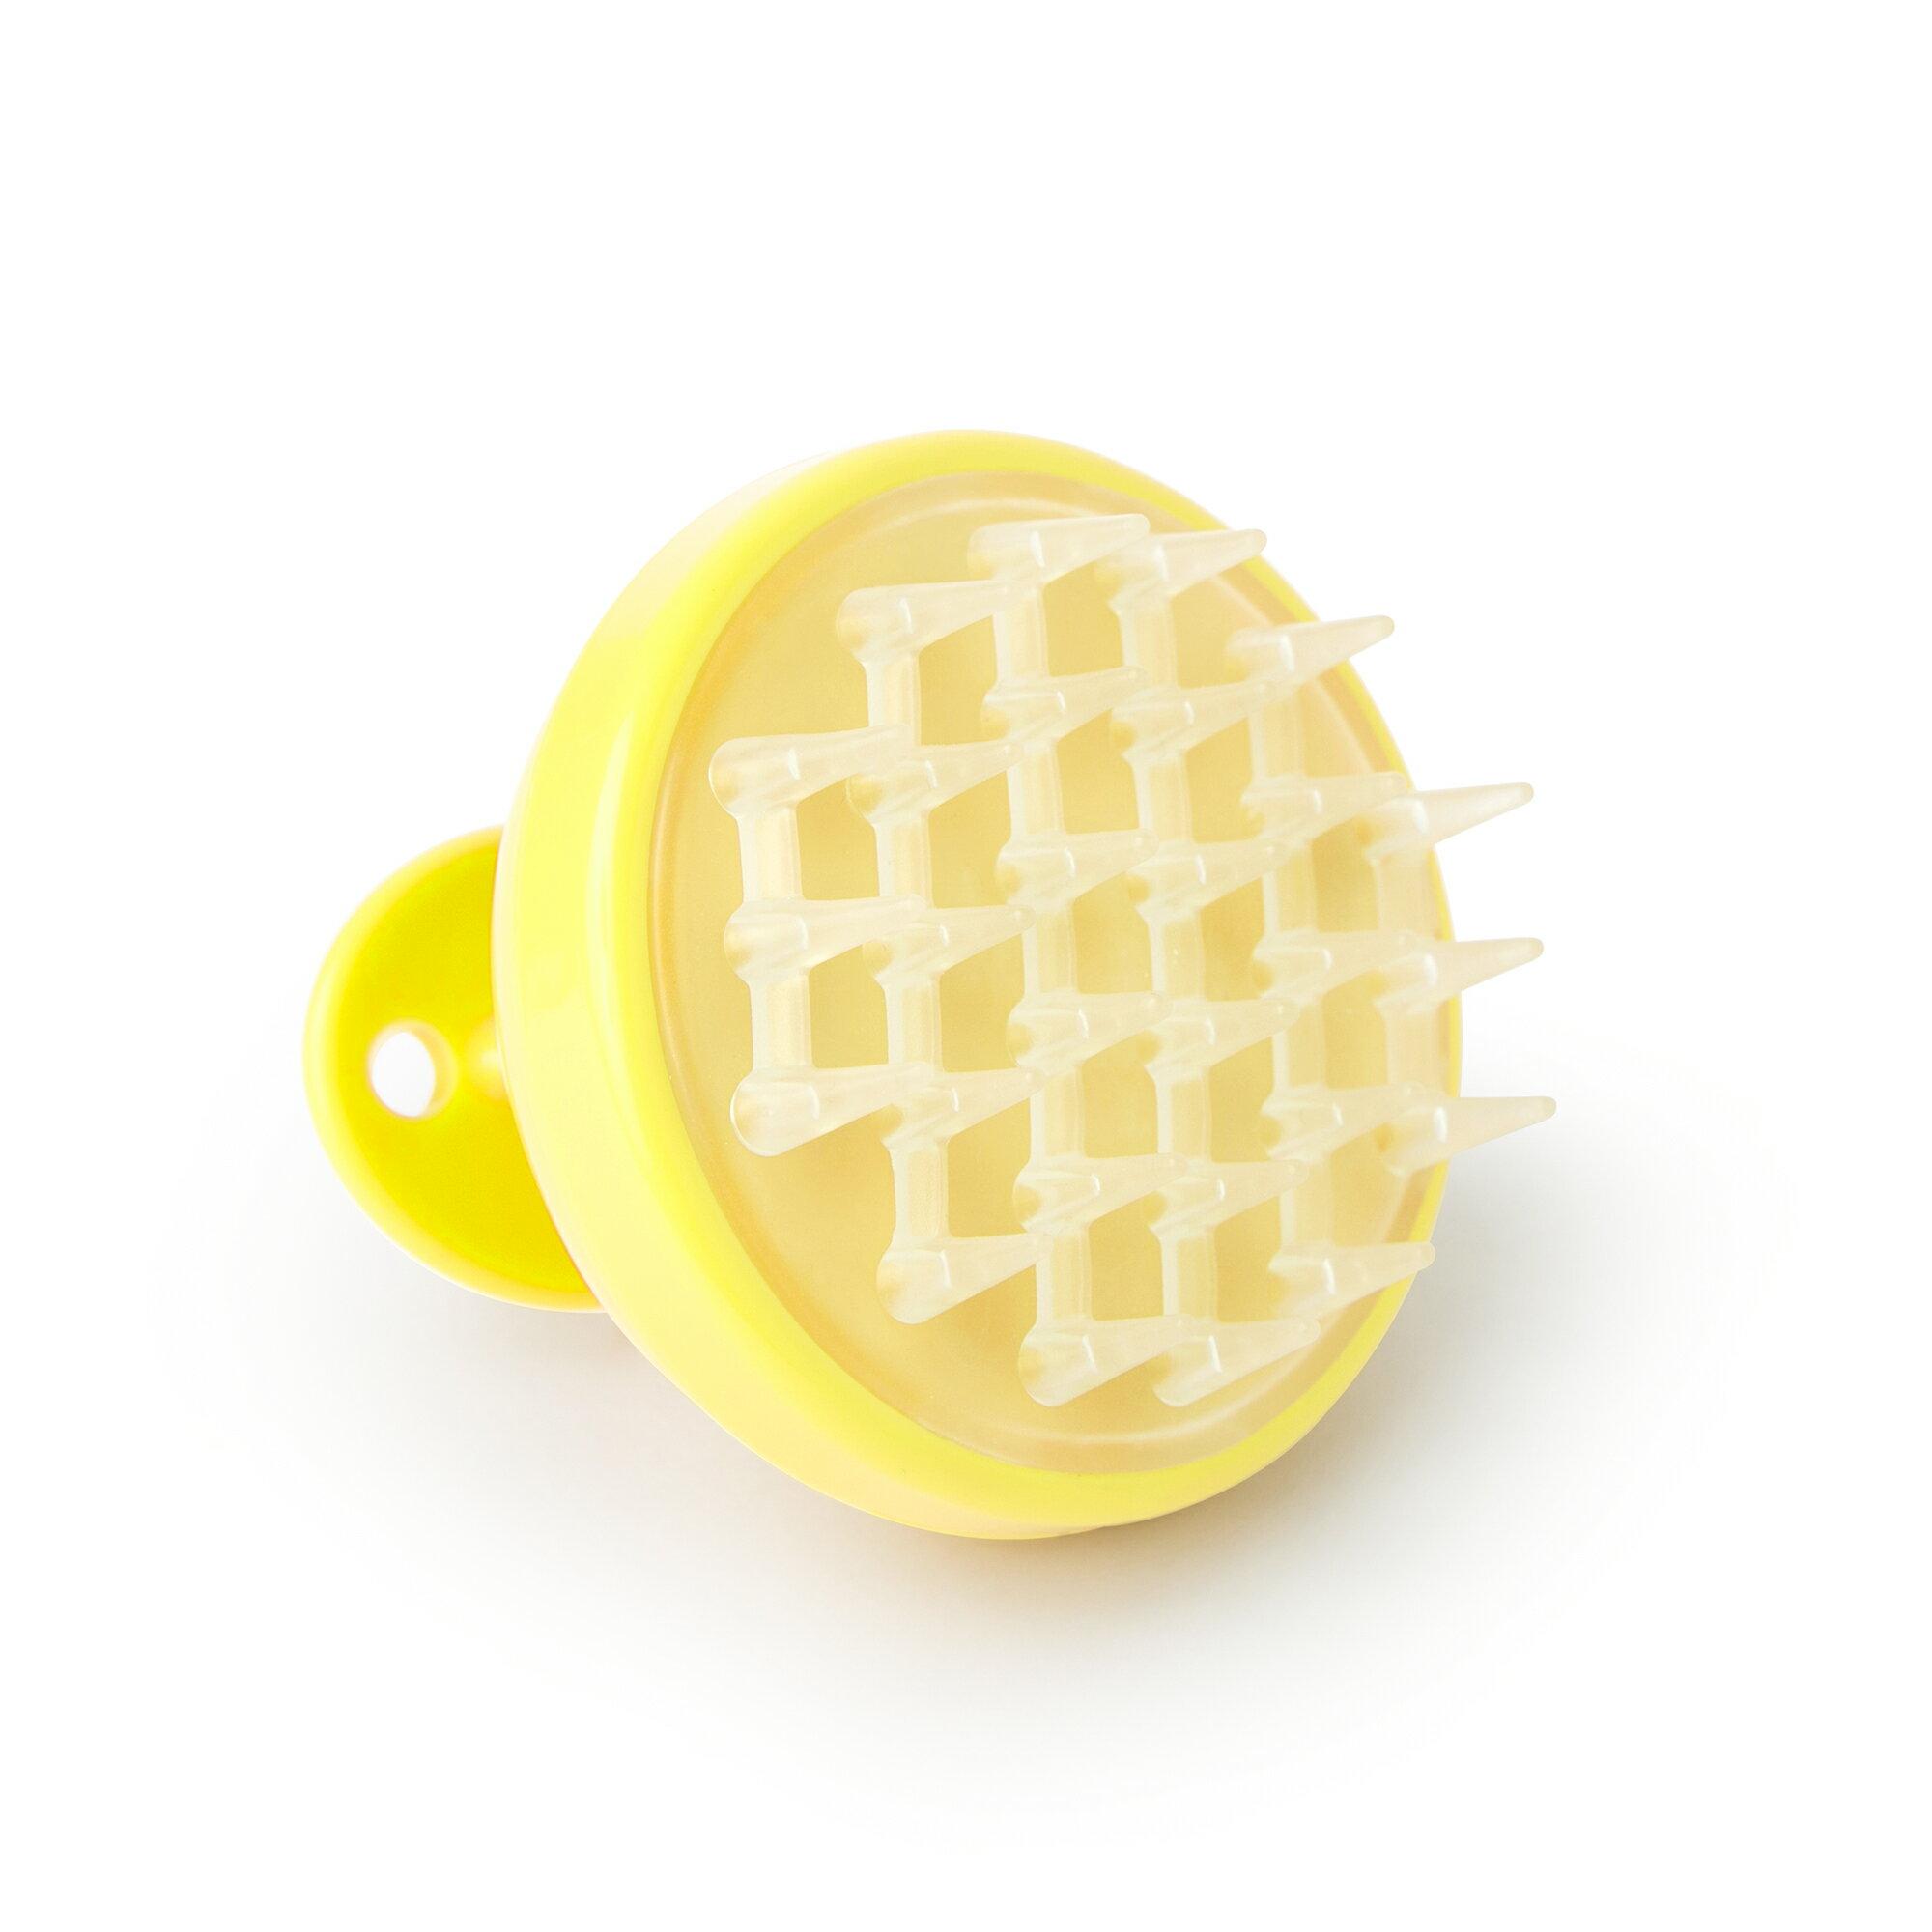 Vanity Planet Groove Vibrating Scalp Massager - Hello Yellow 0